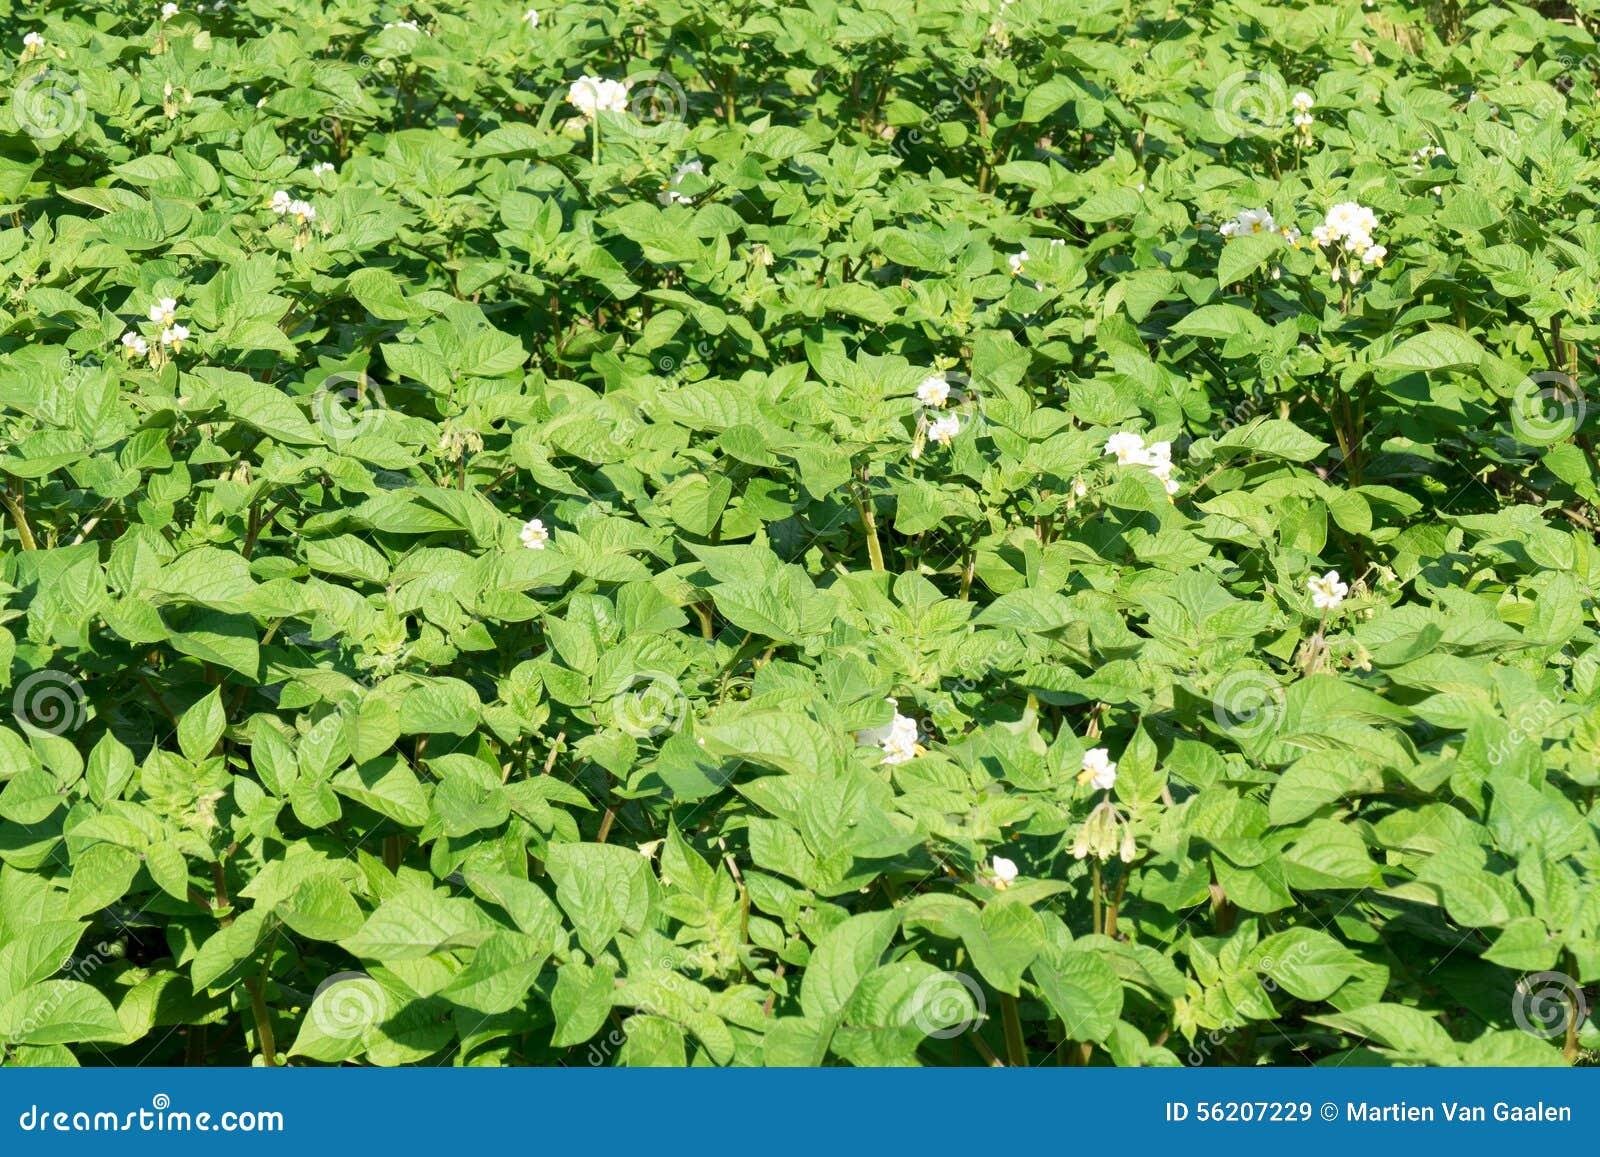 Potato plants stock photo image 56207229 for Dream plants for the natural garden